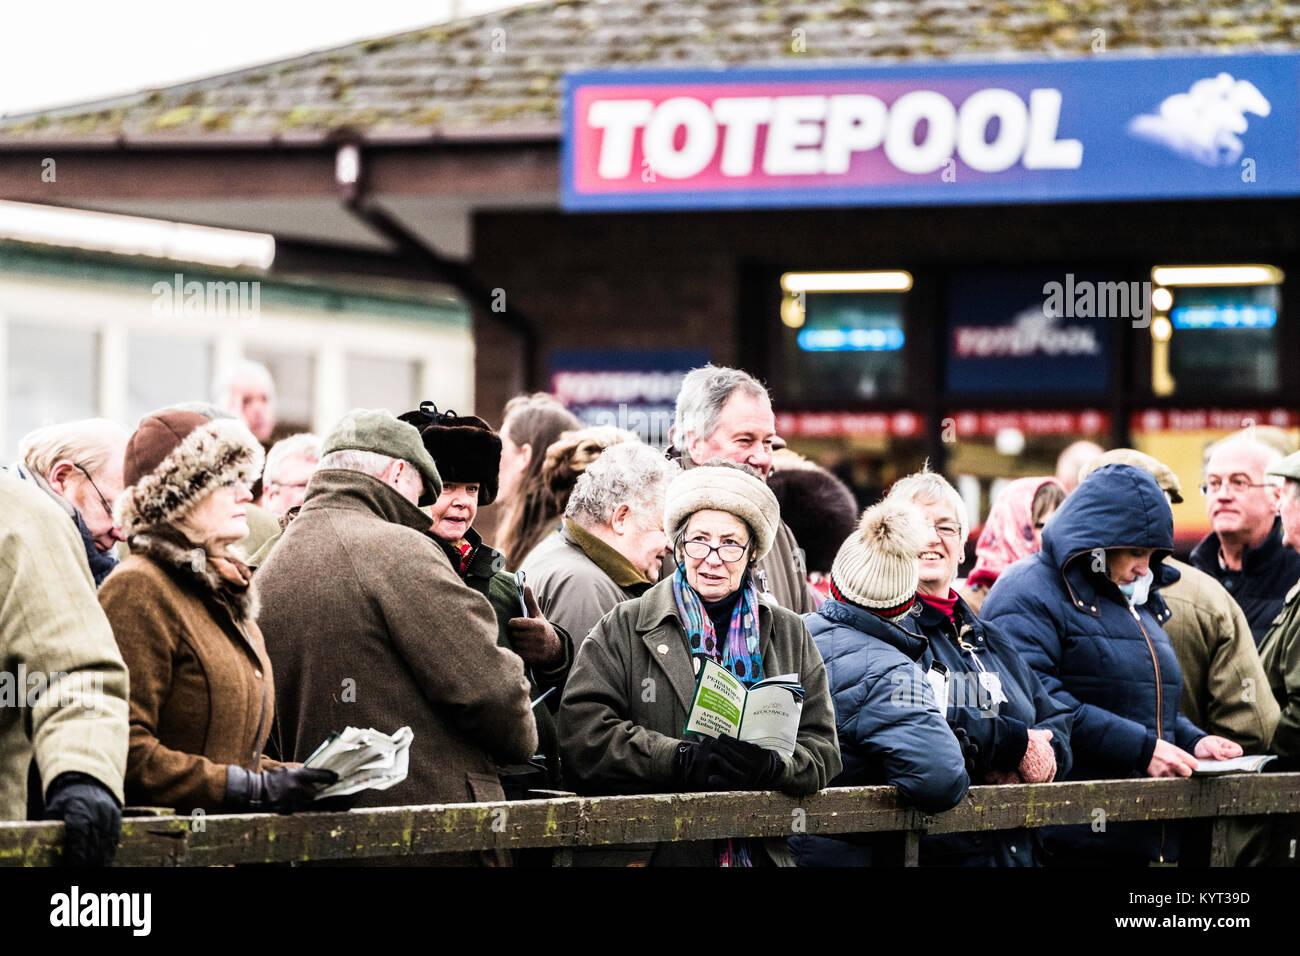 Kelso, Scottish Borders, UK. 14th January 2018. Spectators study form at Kelso Races. - Stock Image